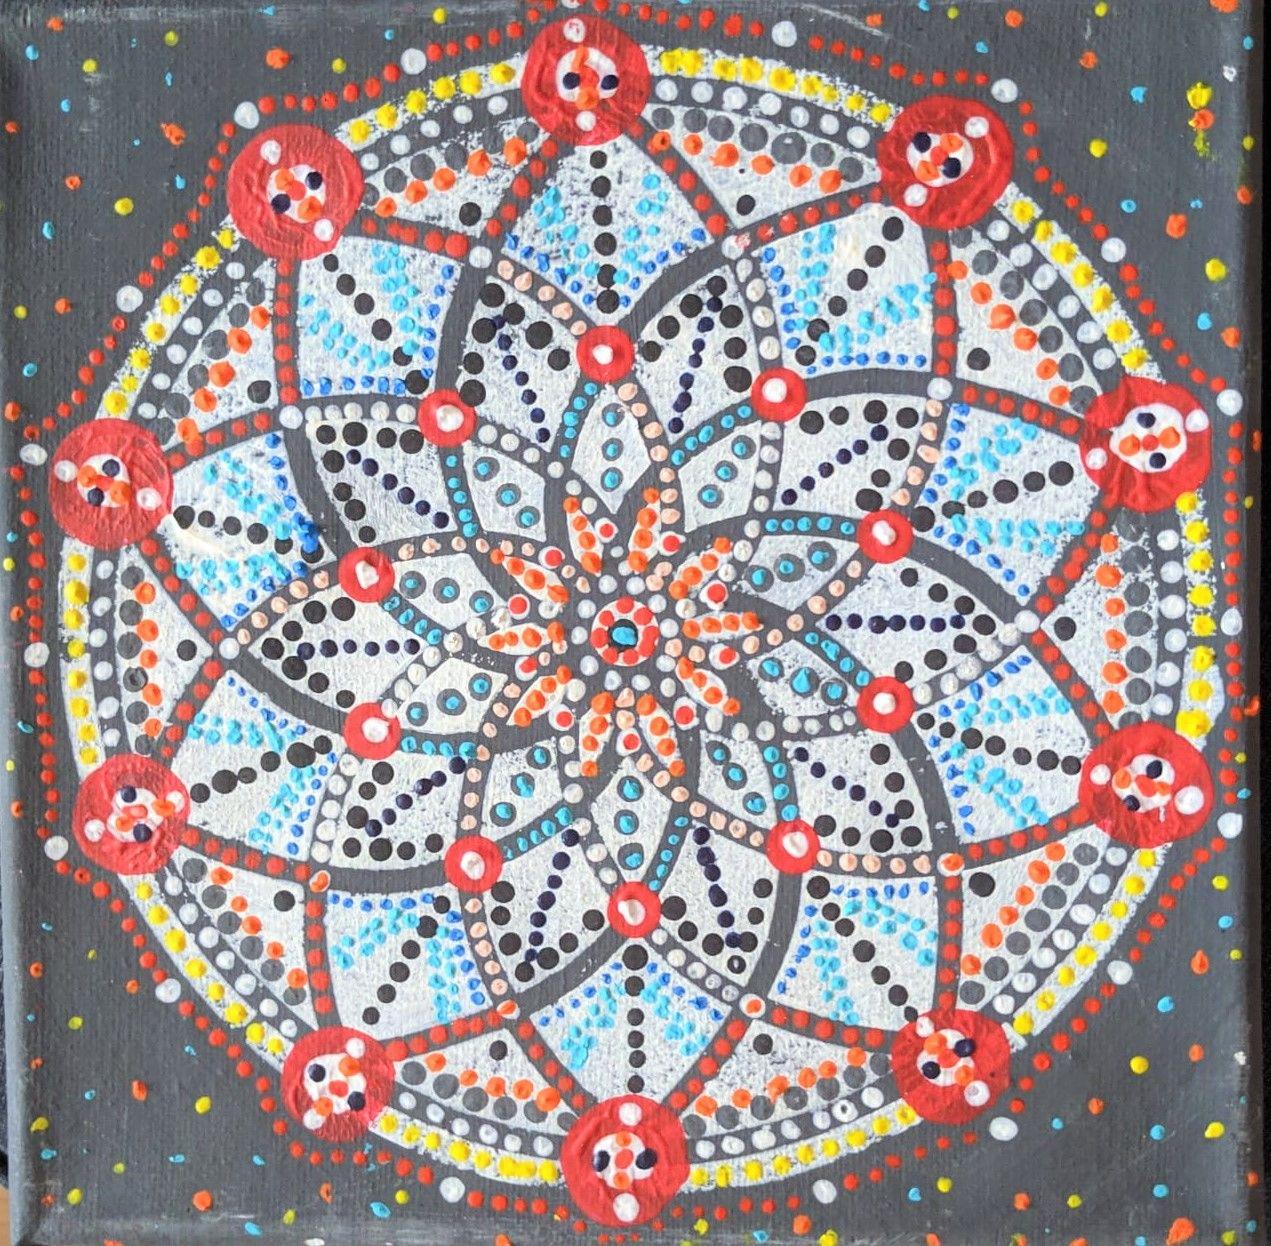 Dot painting mandala kurz